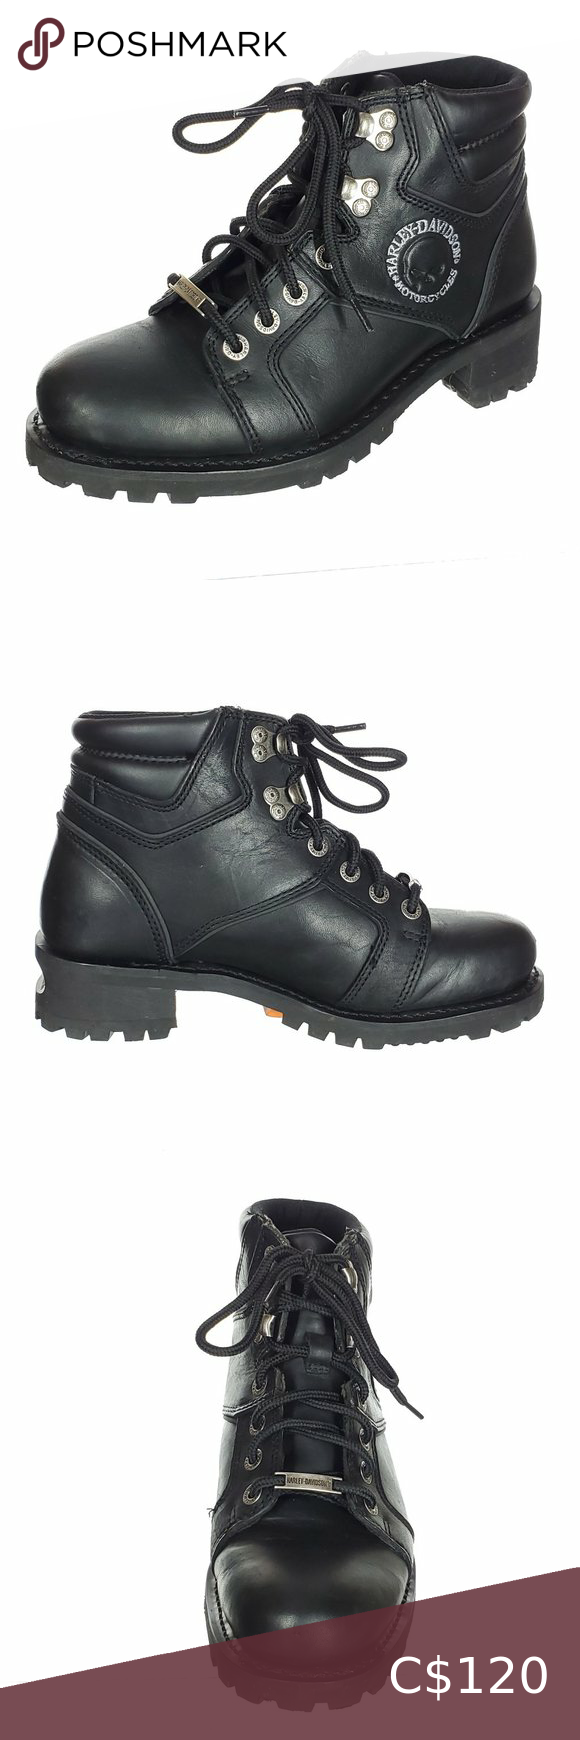 Harley Davidson Leather Boots Peg Bar Heel Bolt Harley Davidson Shoes Leather Boots Harley Davidson Motorcycle Boots